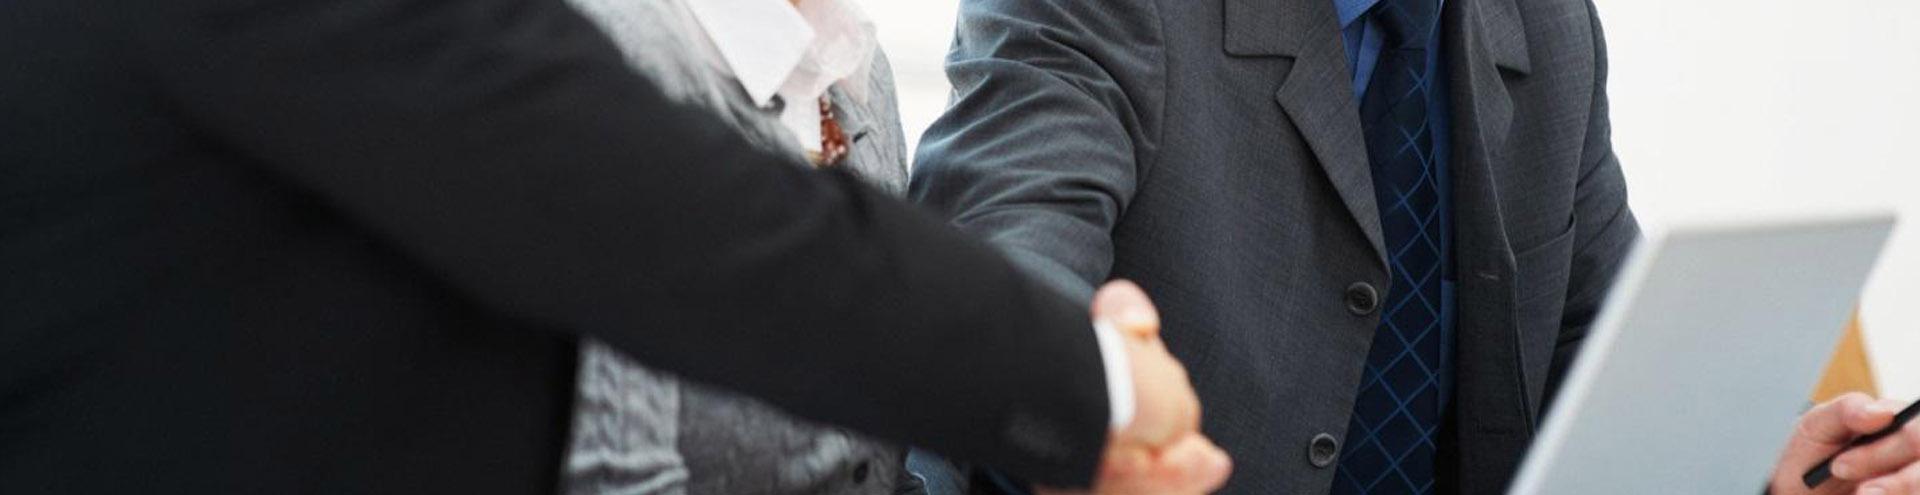 консультация юриста в Ярославле